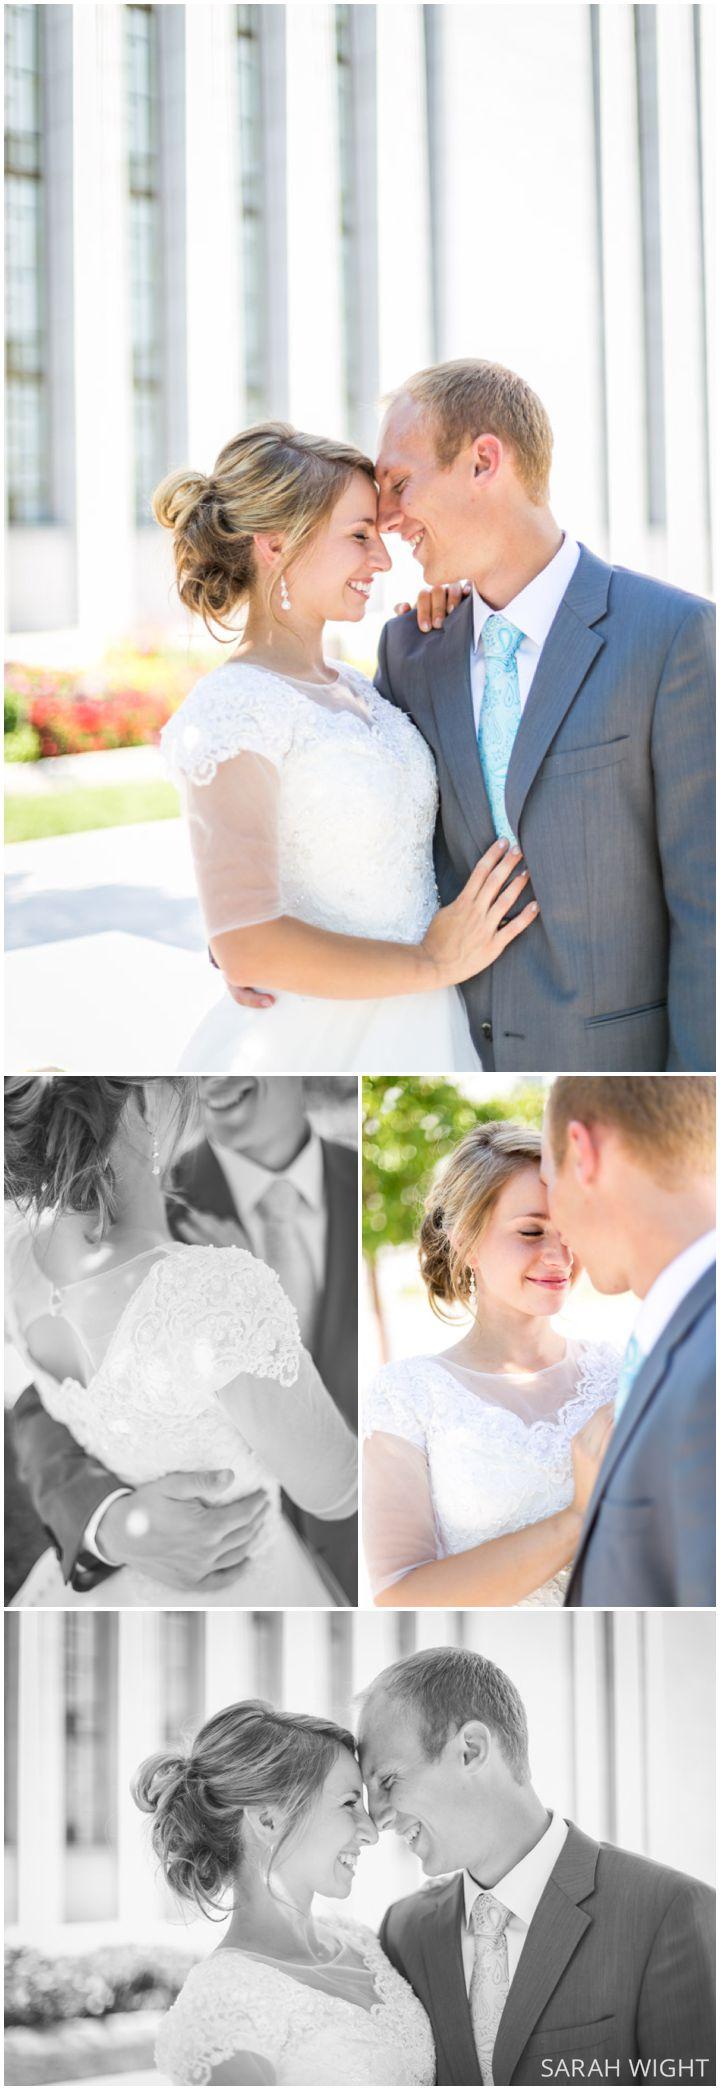 Utah Wedding Bungalow Draper Photographer-16.jpg